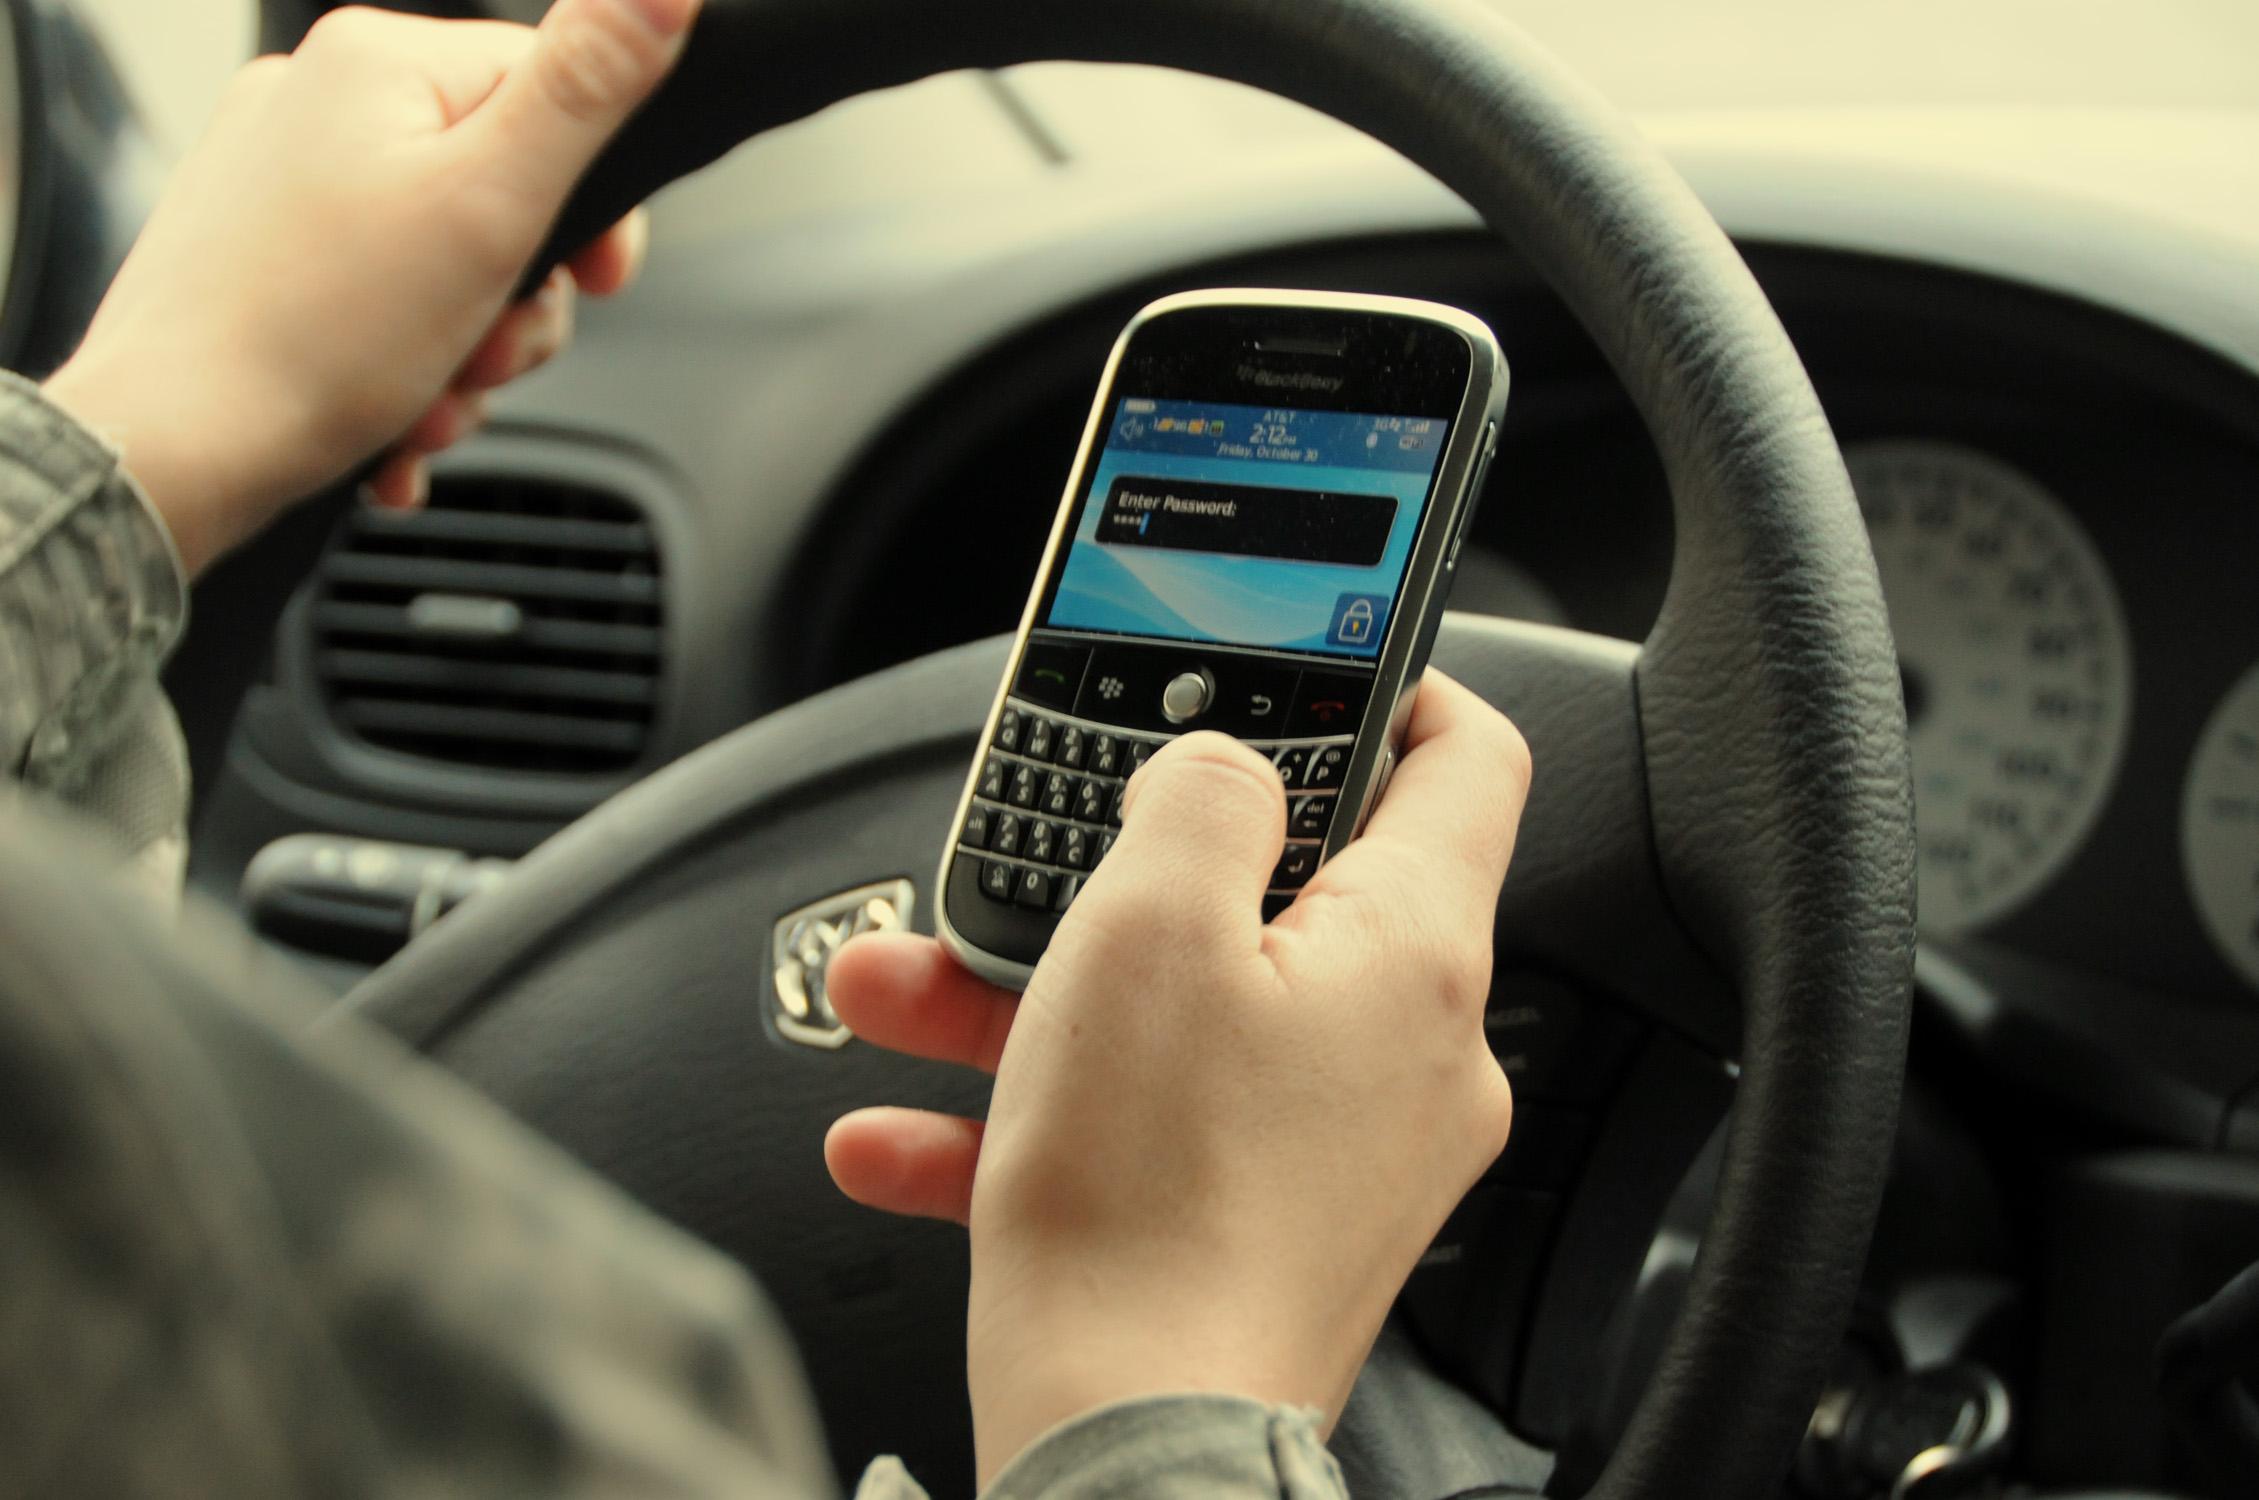 Brits Reveal Phone Habits That Drive Them Crazy